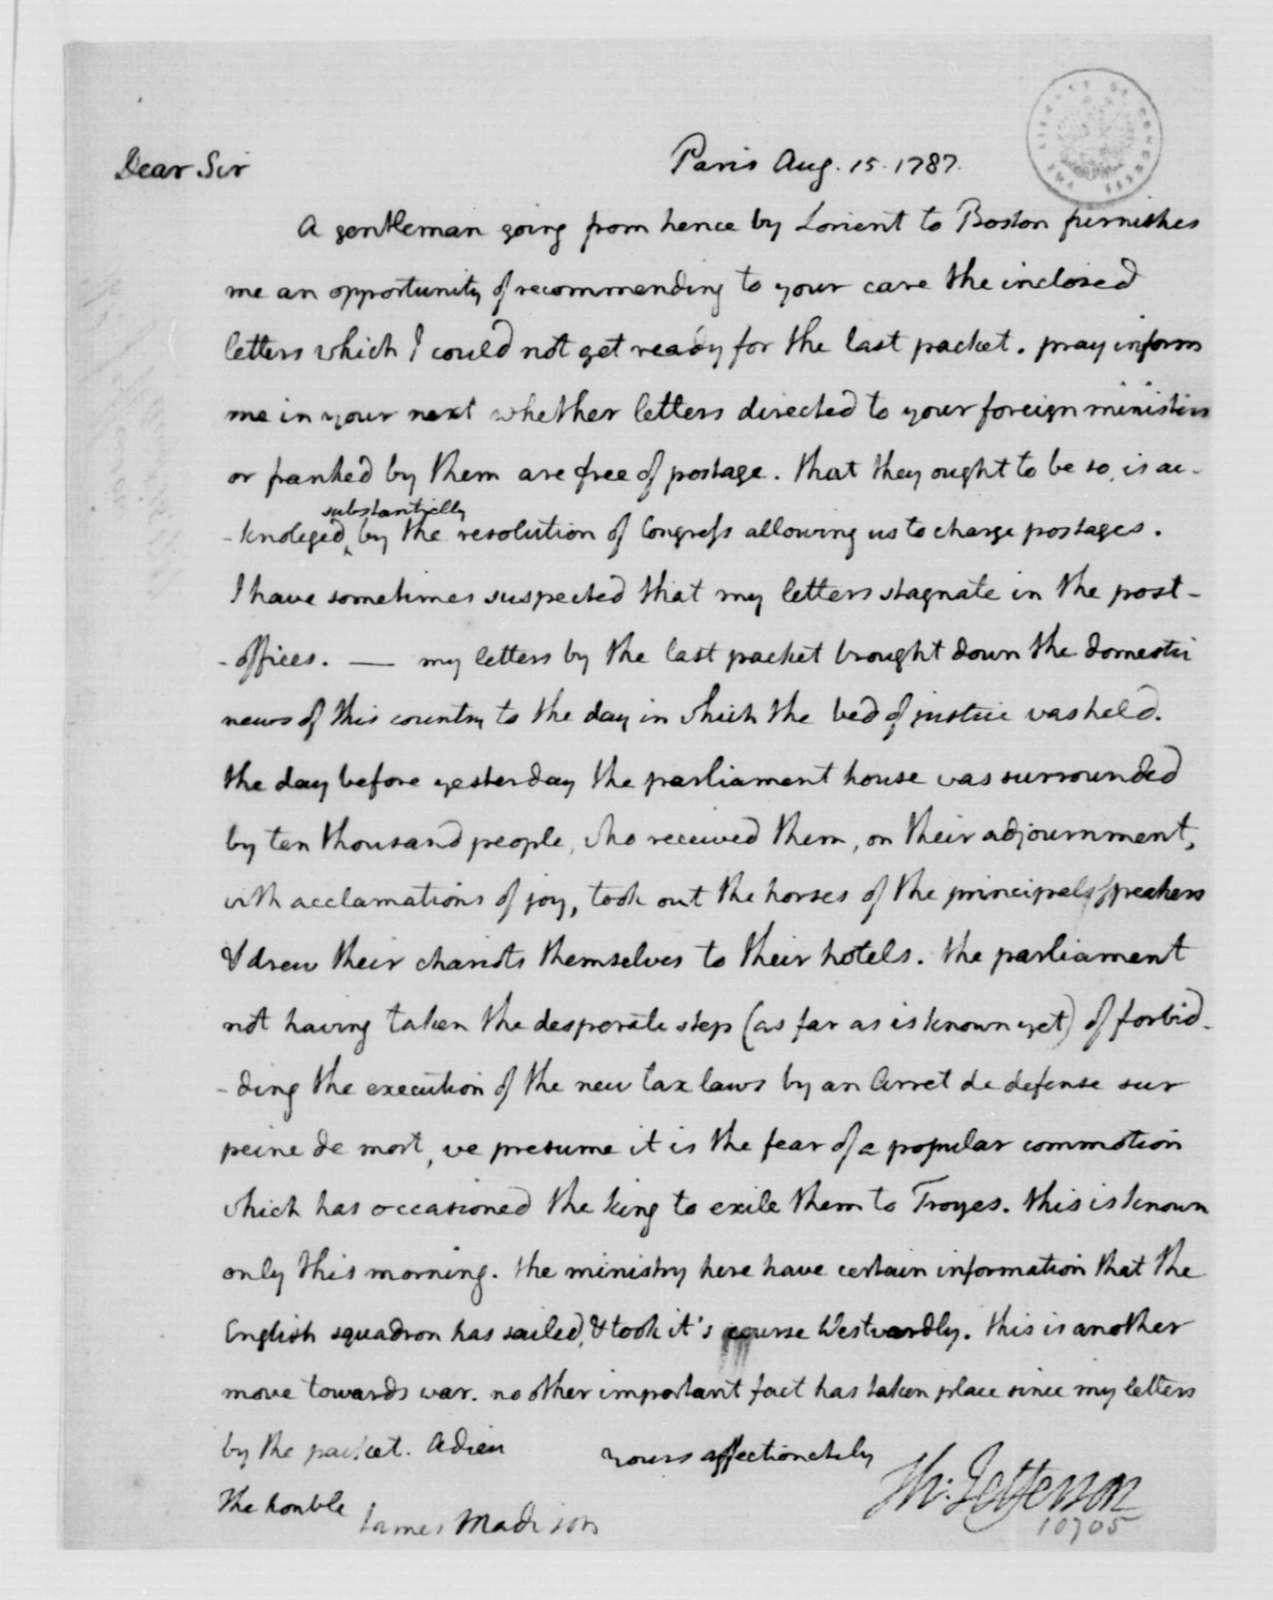 Thomas Jefferson to James Madison, August 15, 1787.